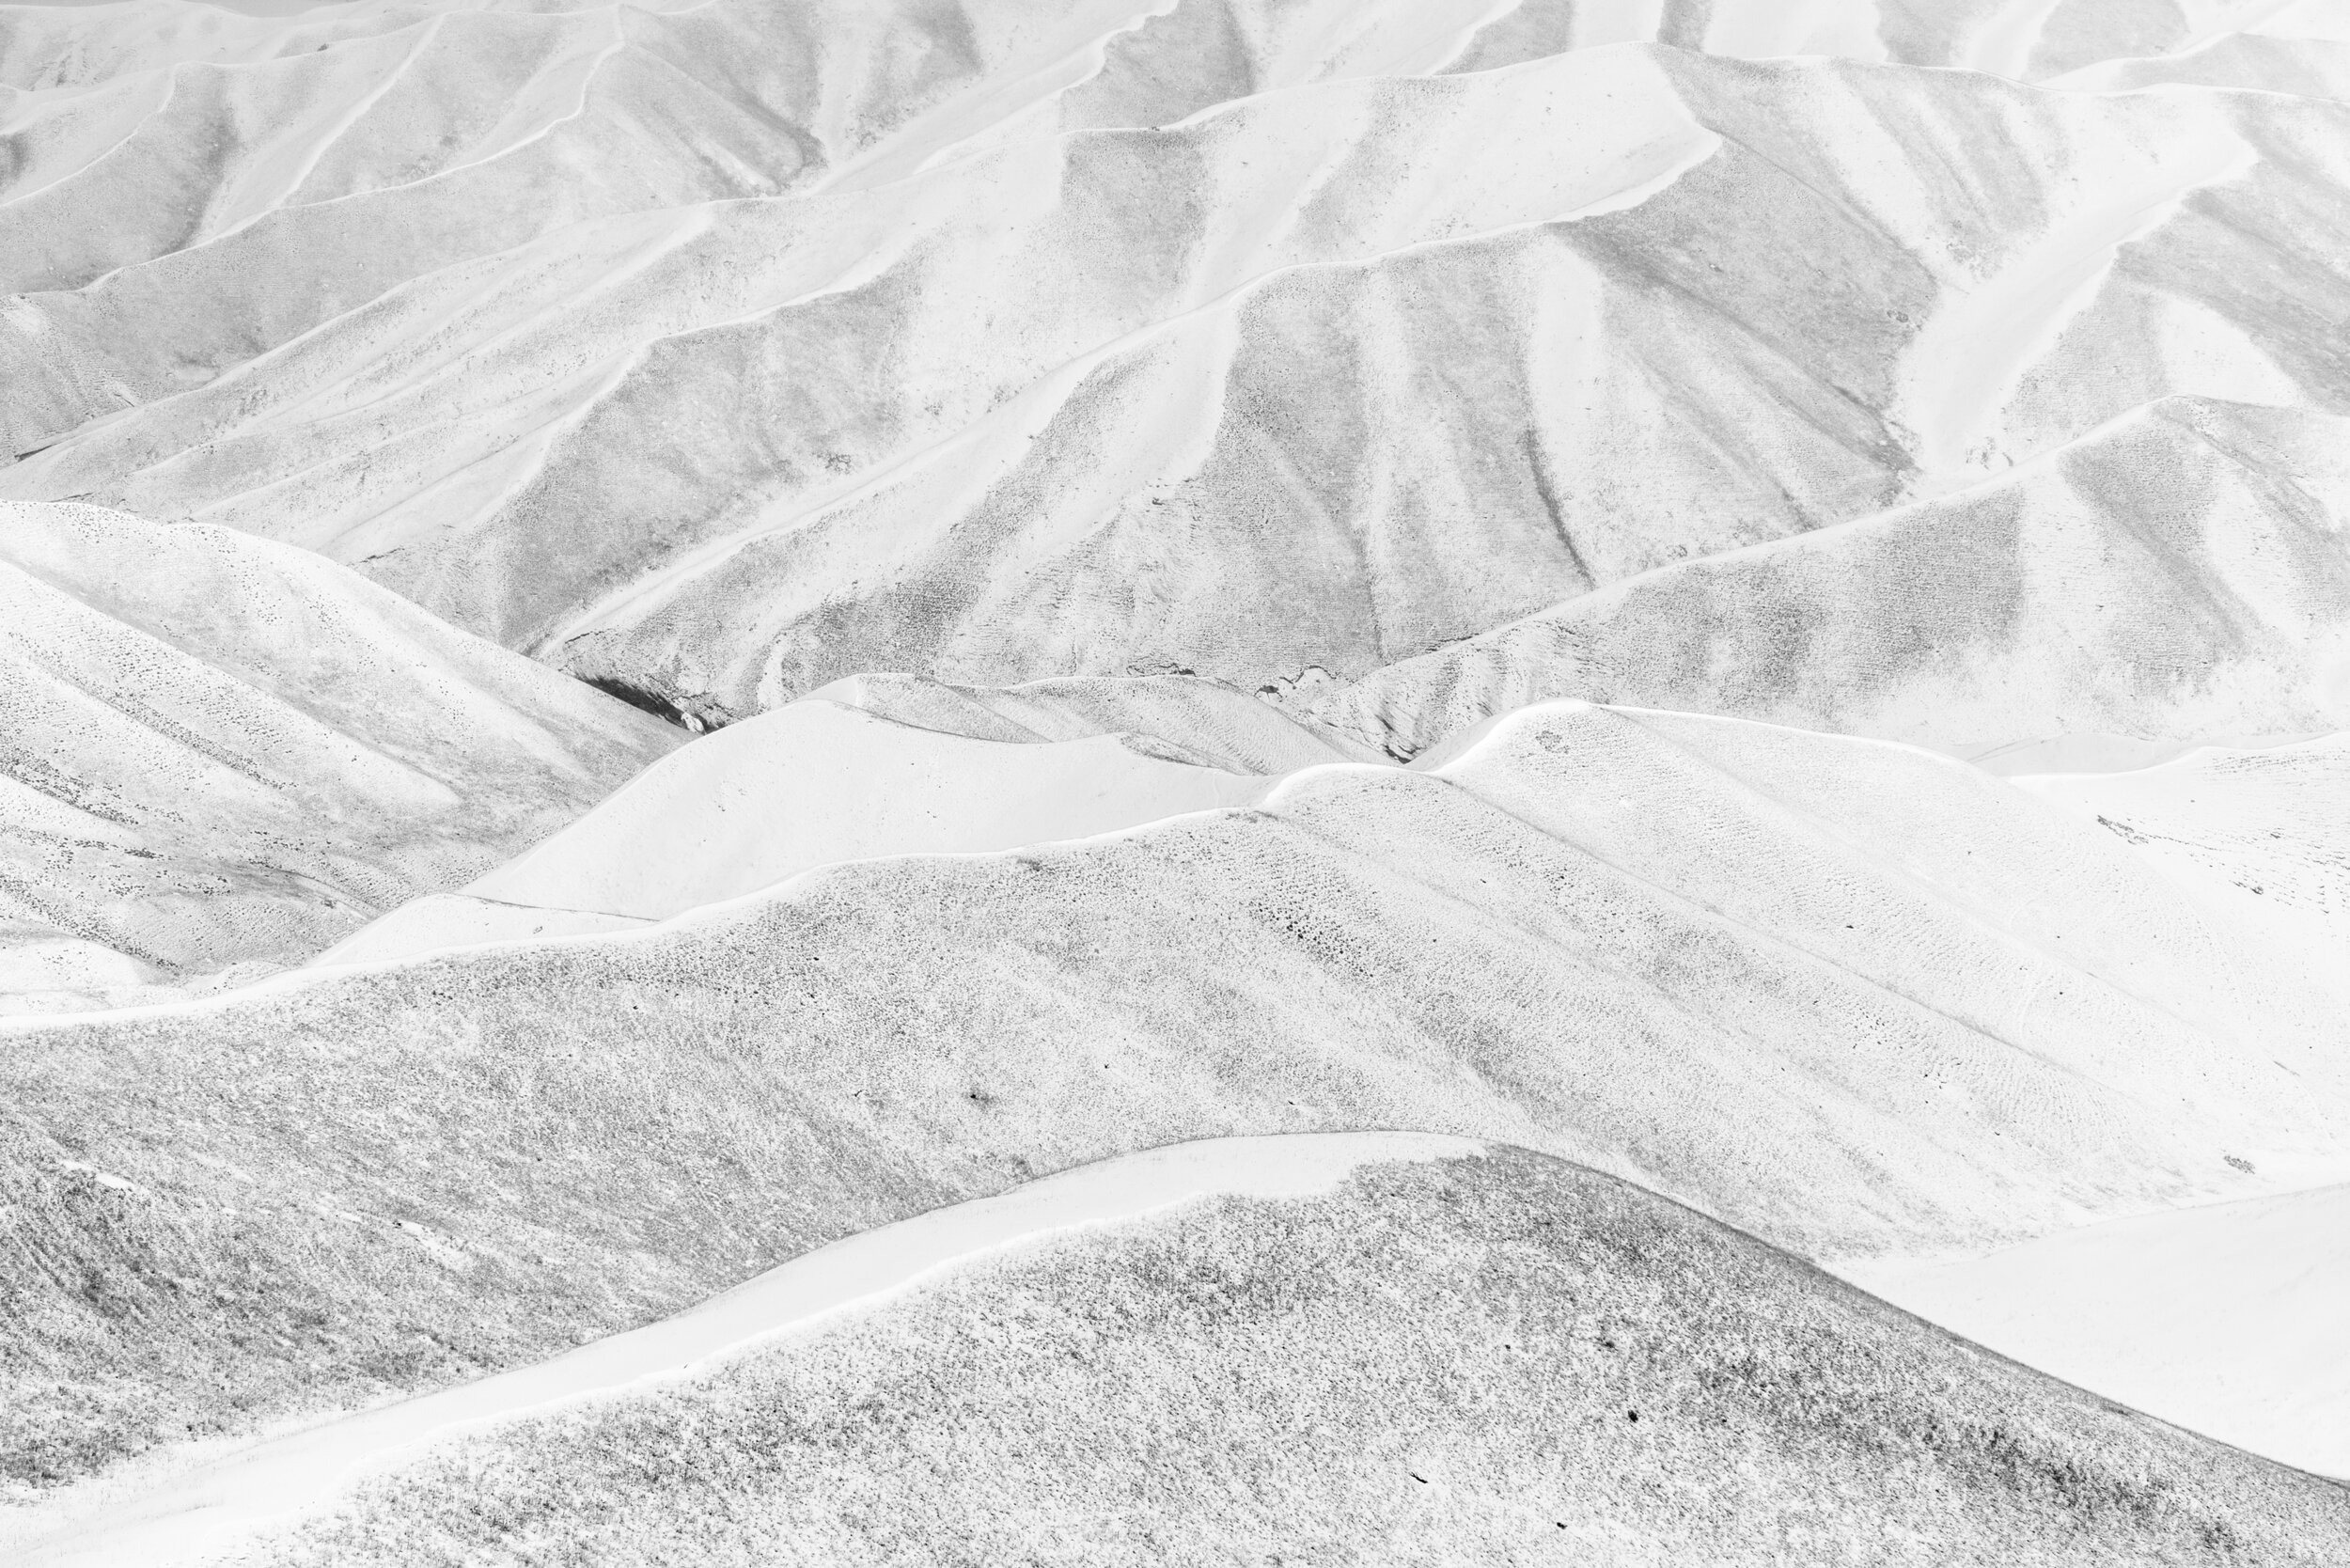 Horse Head #1A - Foto geprint op Fine Art Pearl Baryta (Satin) 285gsm Papier - 40 x 60 cm - 60 x 90 cm - 90 x 135 cm - 135 x 195 cm